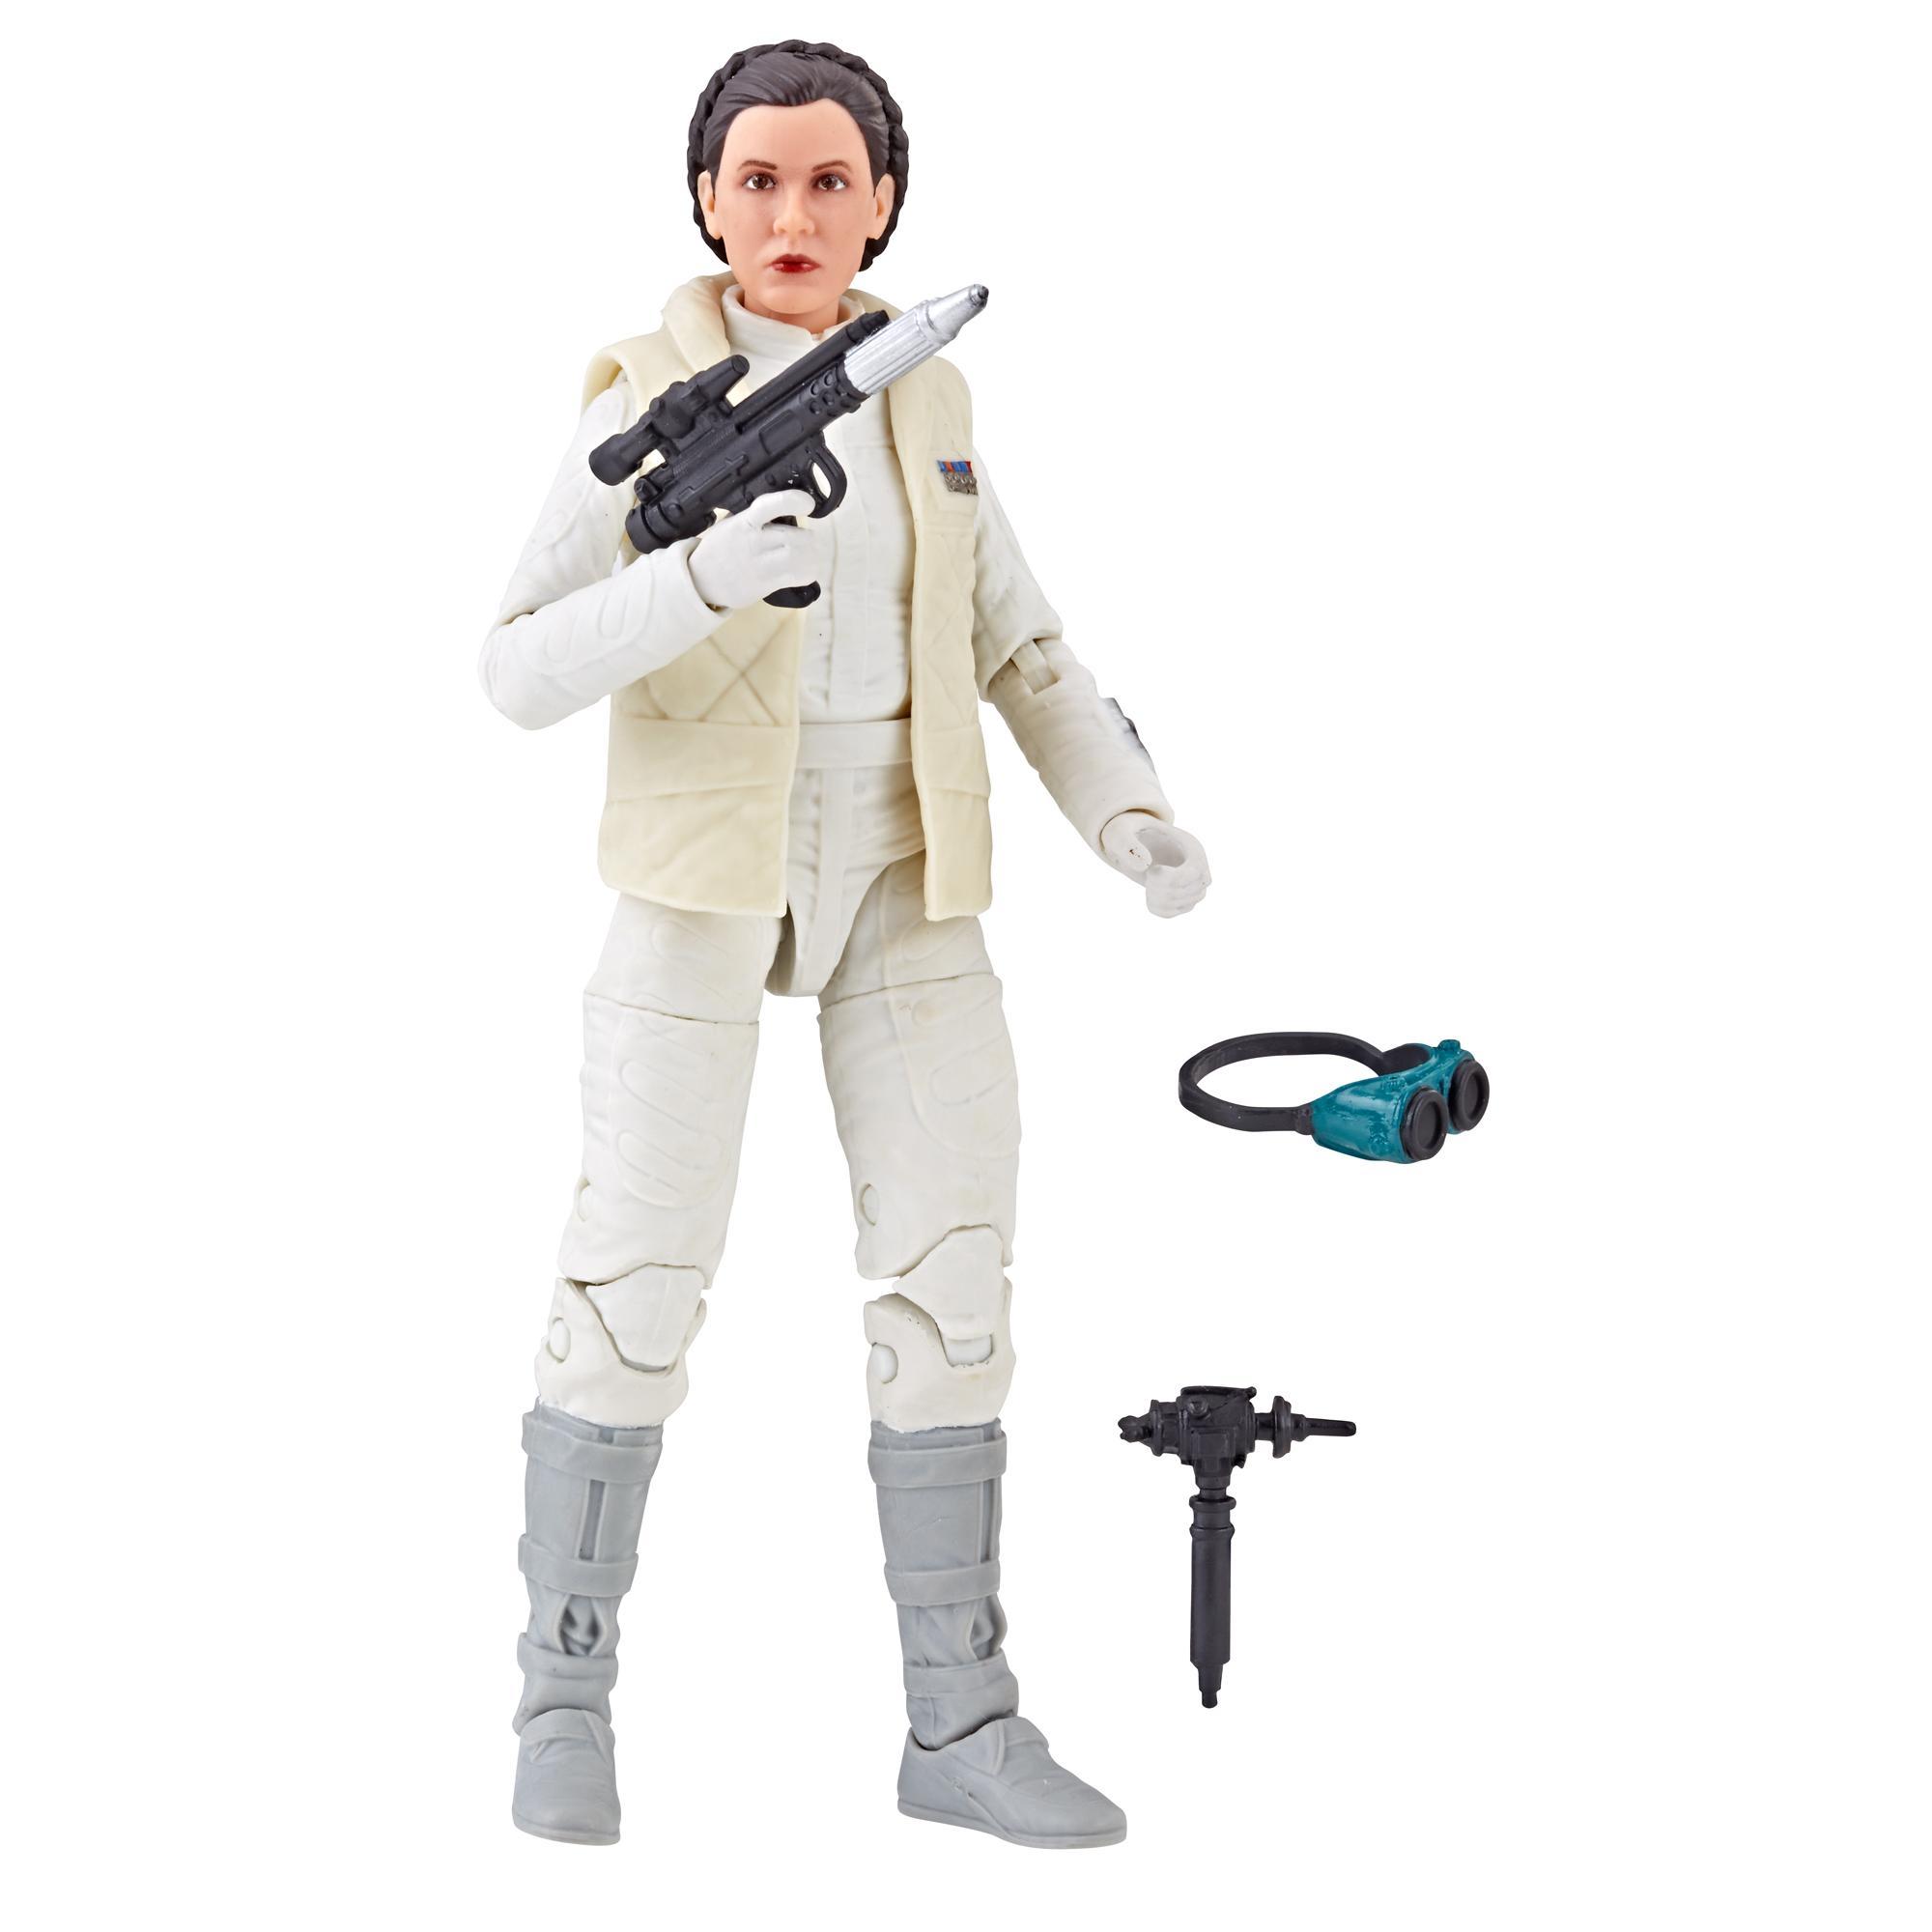 Star Wars The Black Series 6-inch Princess Leia Organa (Hoth) figure